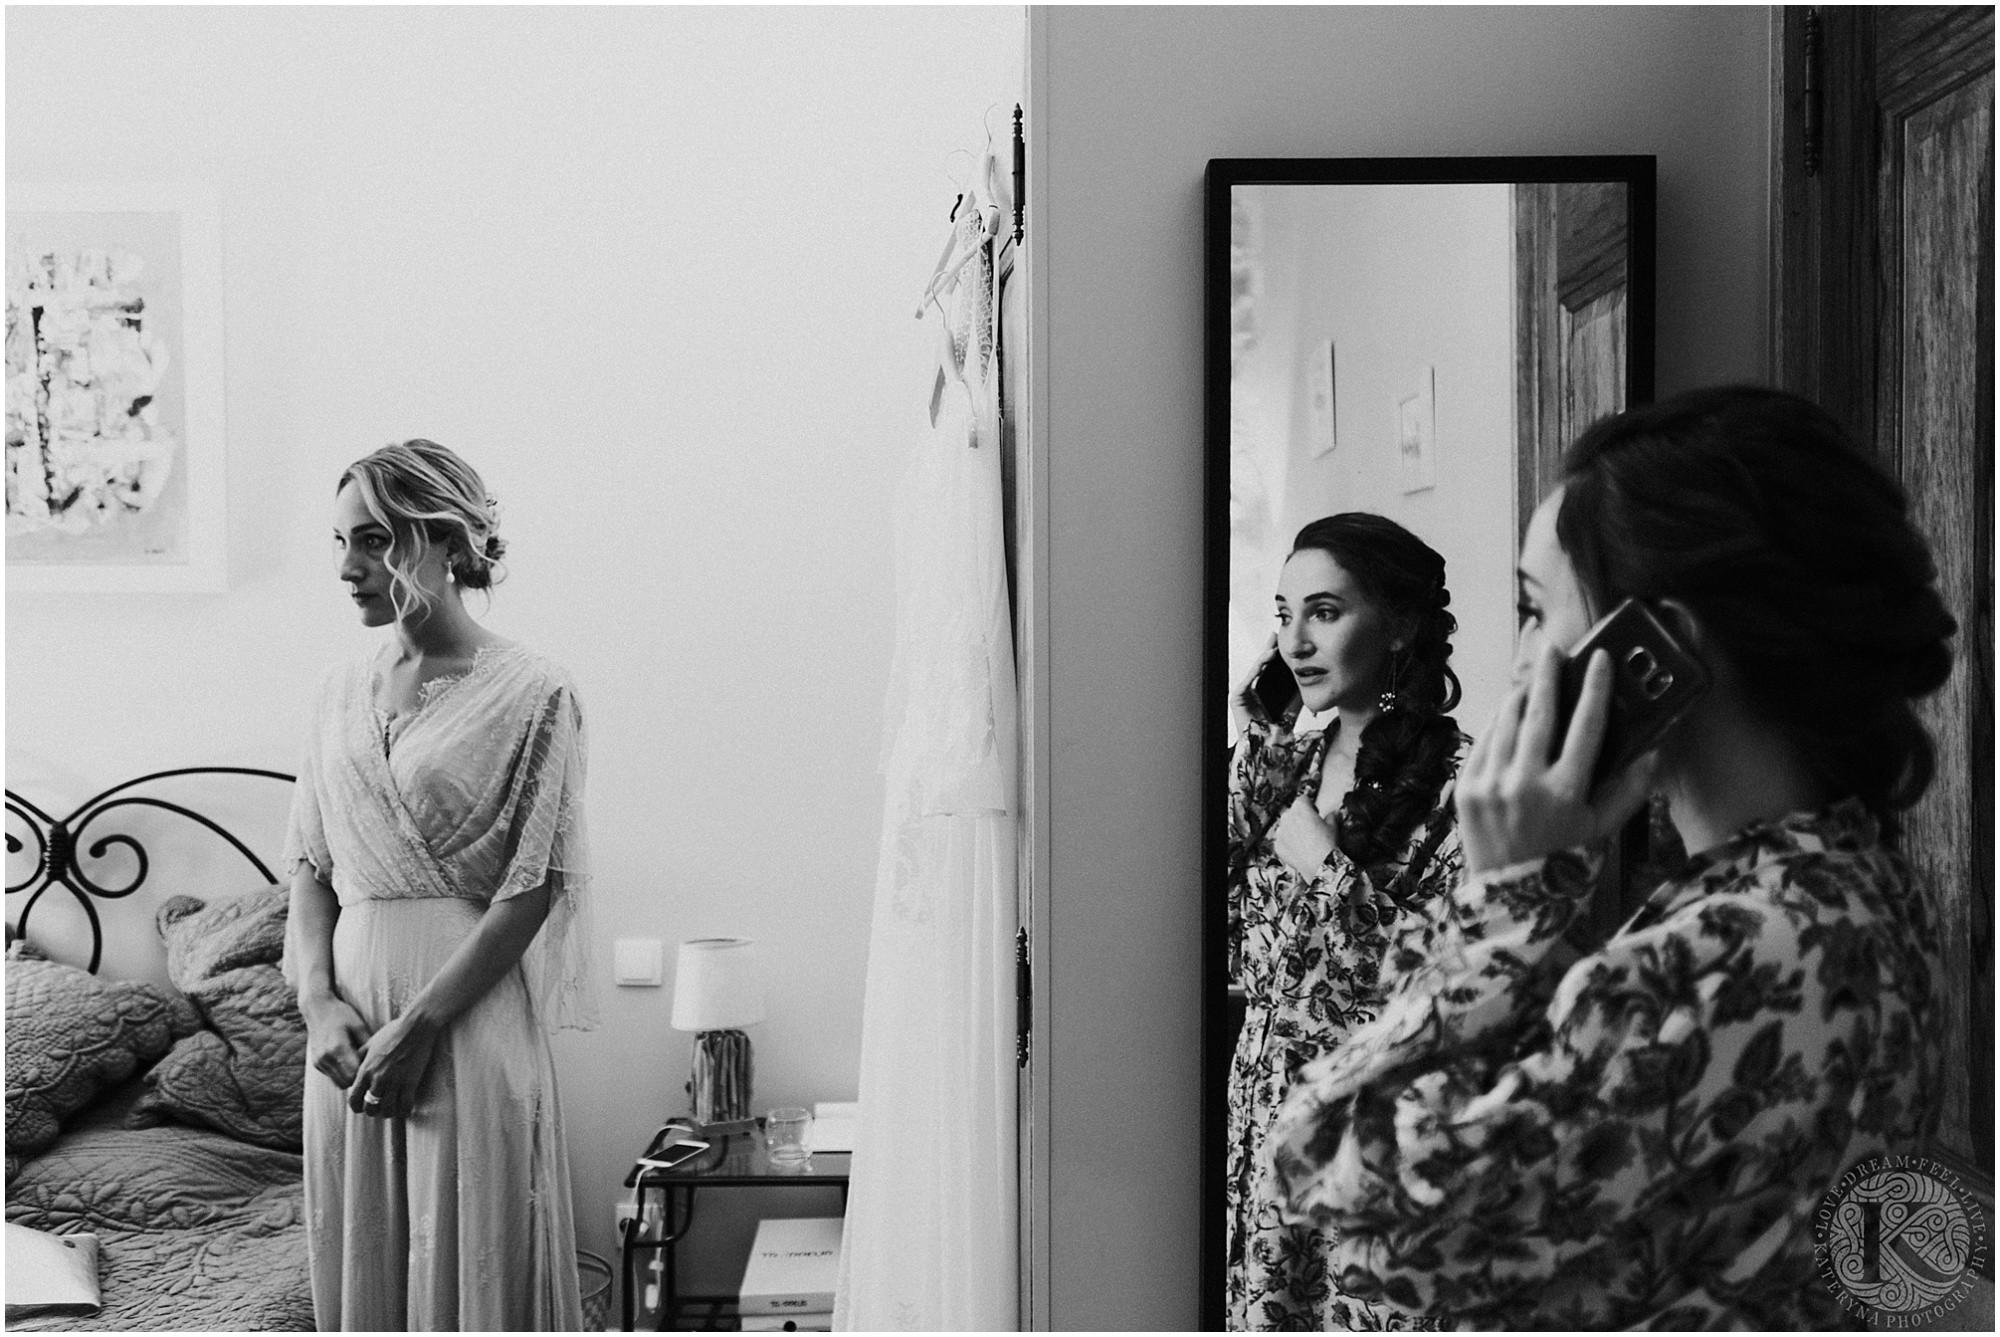 Kateryna-photos-photographe-mariage-vaucluse-provence-avignon-ferme-st-hugues_0015.jpg